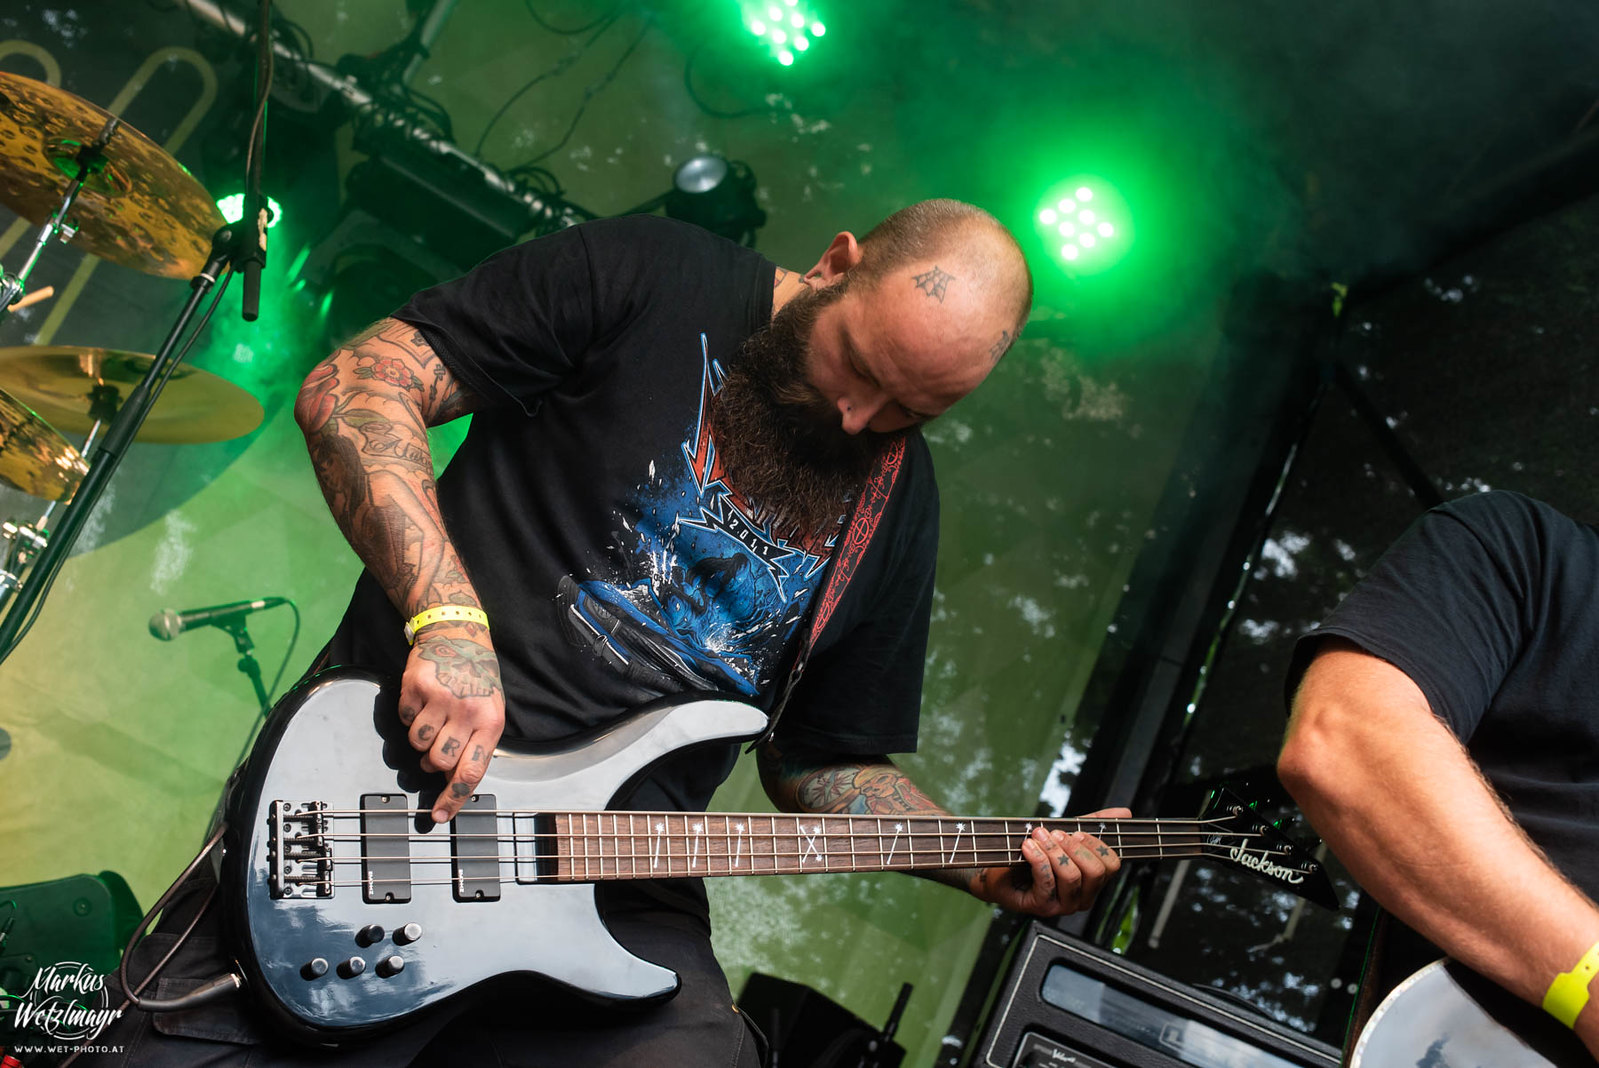 NEMESIS MY ENEMY - Metalheads Against Racism Vol. 8, Donauinselfest Vienna